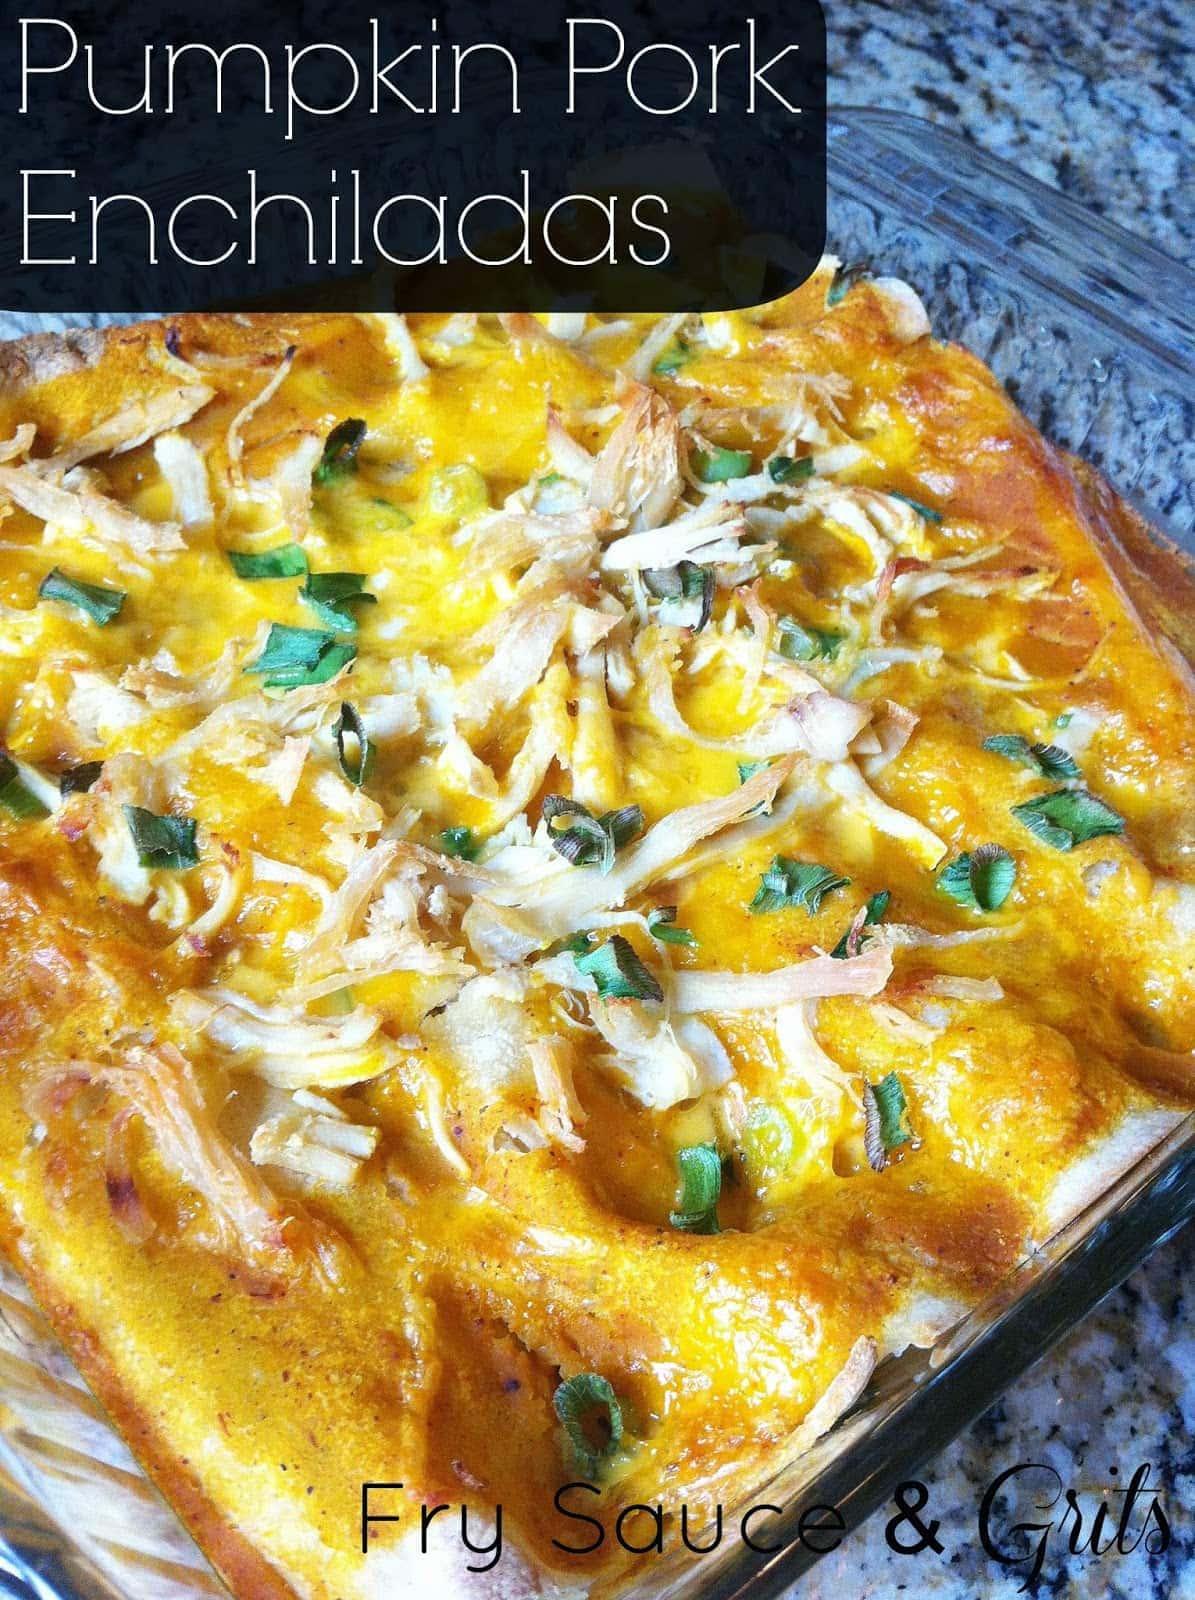 Pumpkin Pork Enchiladas from FrySauceandGrits.com